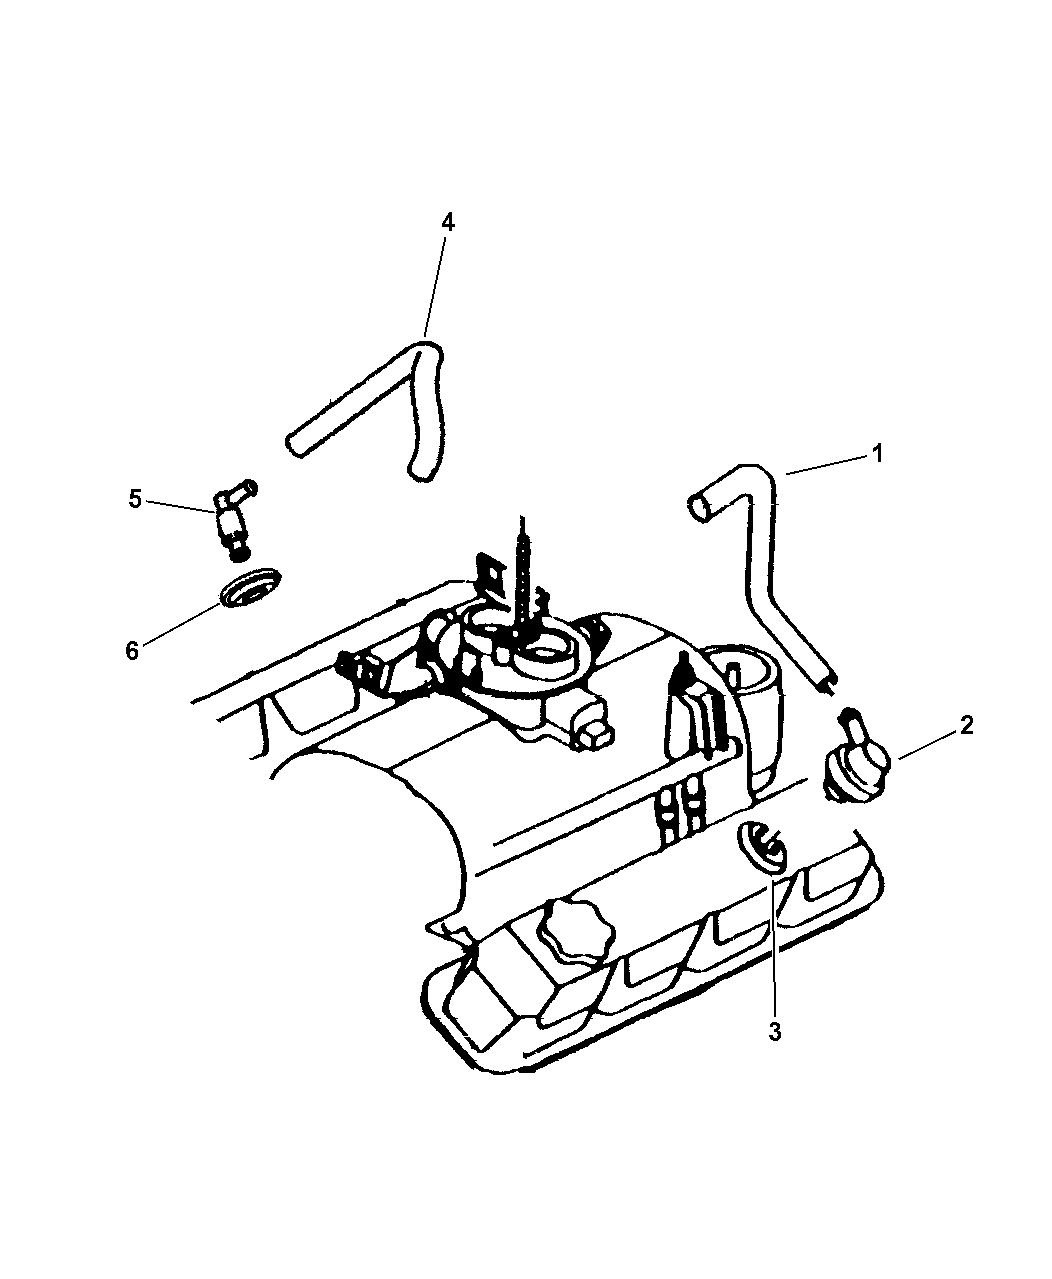 2001 Dodge Ram 2500 Engine Diagram - Cars Wiring Diagram Blog